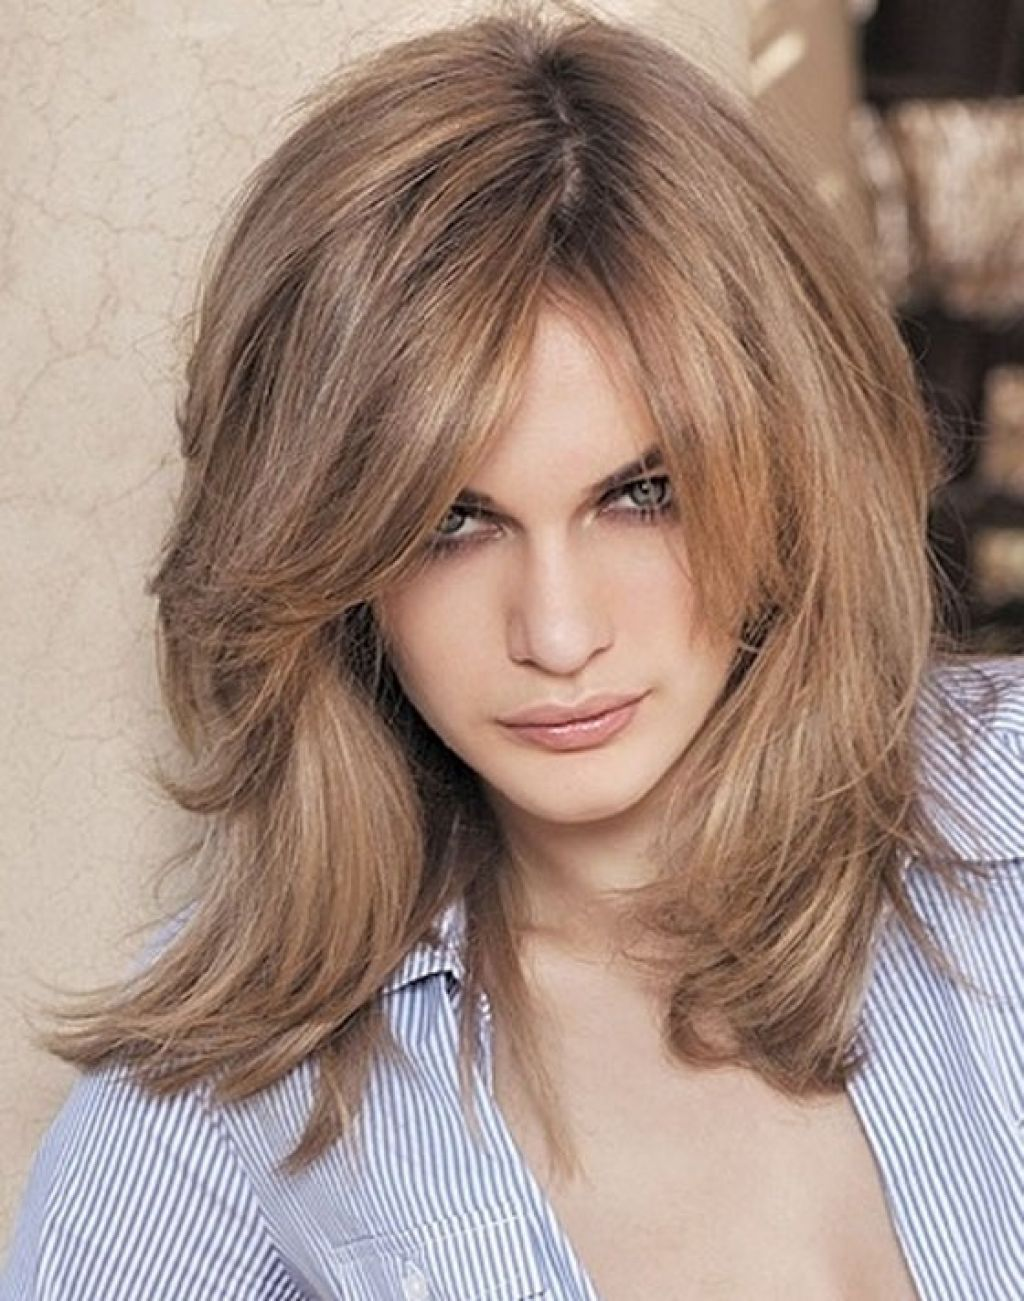 https://www.google.com.tw/search?q=hairstyles for women | 01剪髮設計 ...